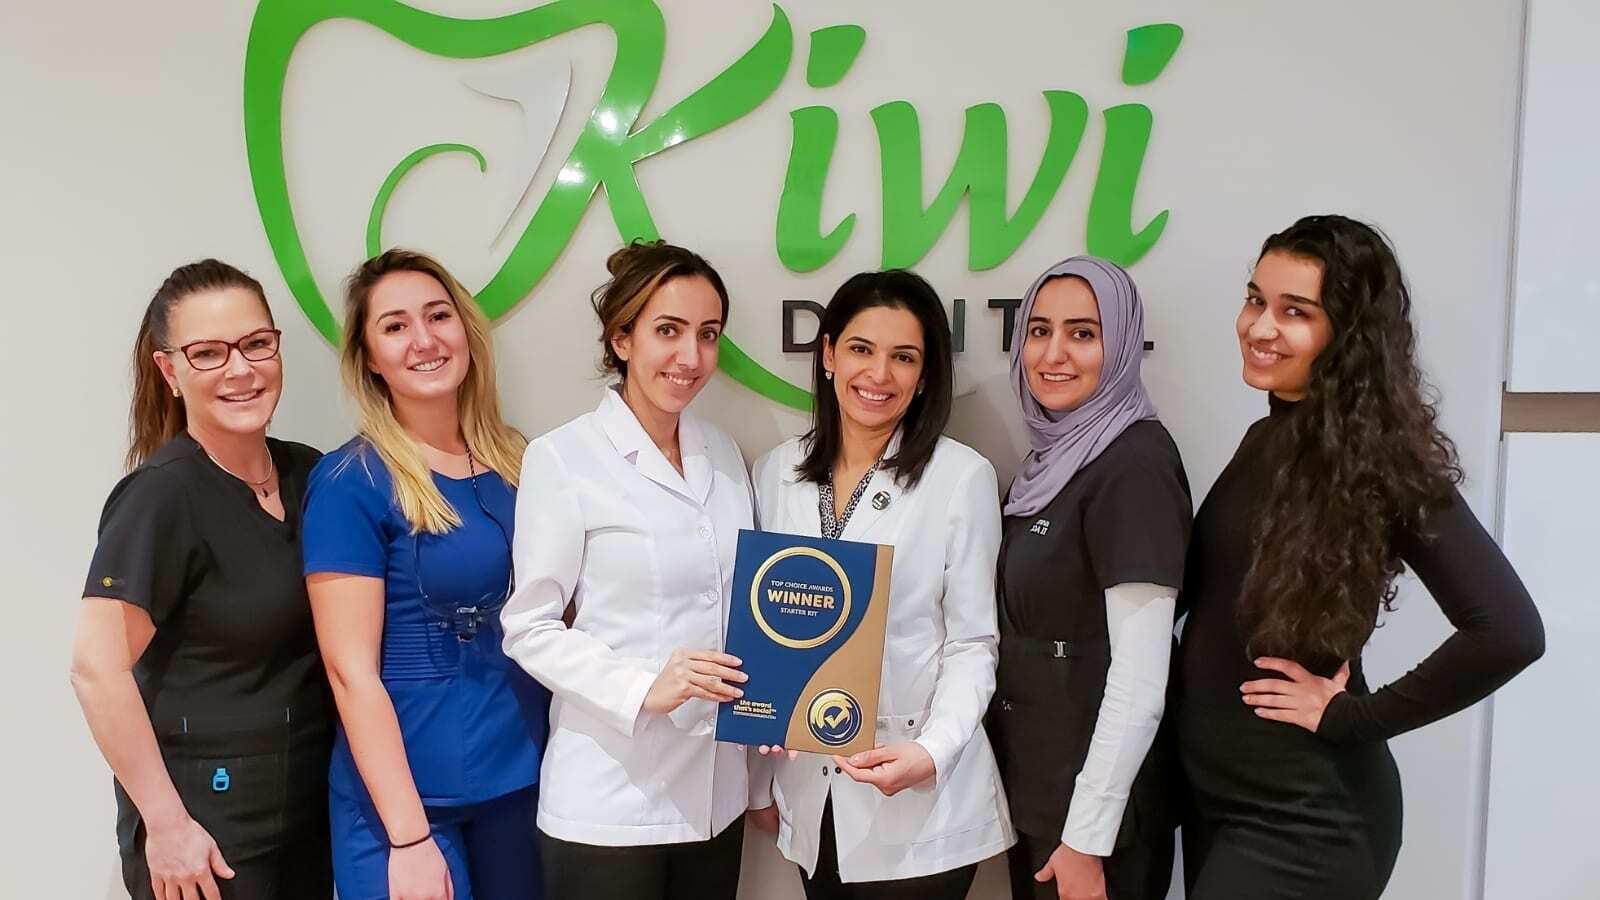 Kiwi_Dental_Staff_Posing_With_Award